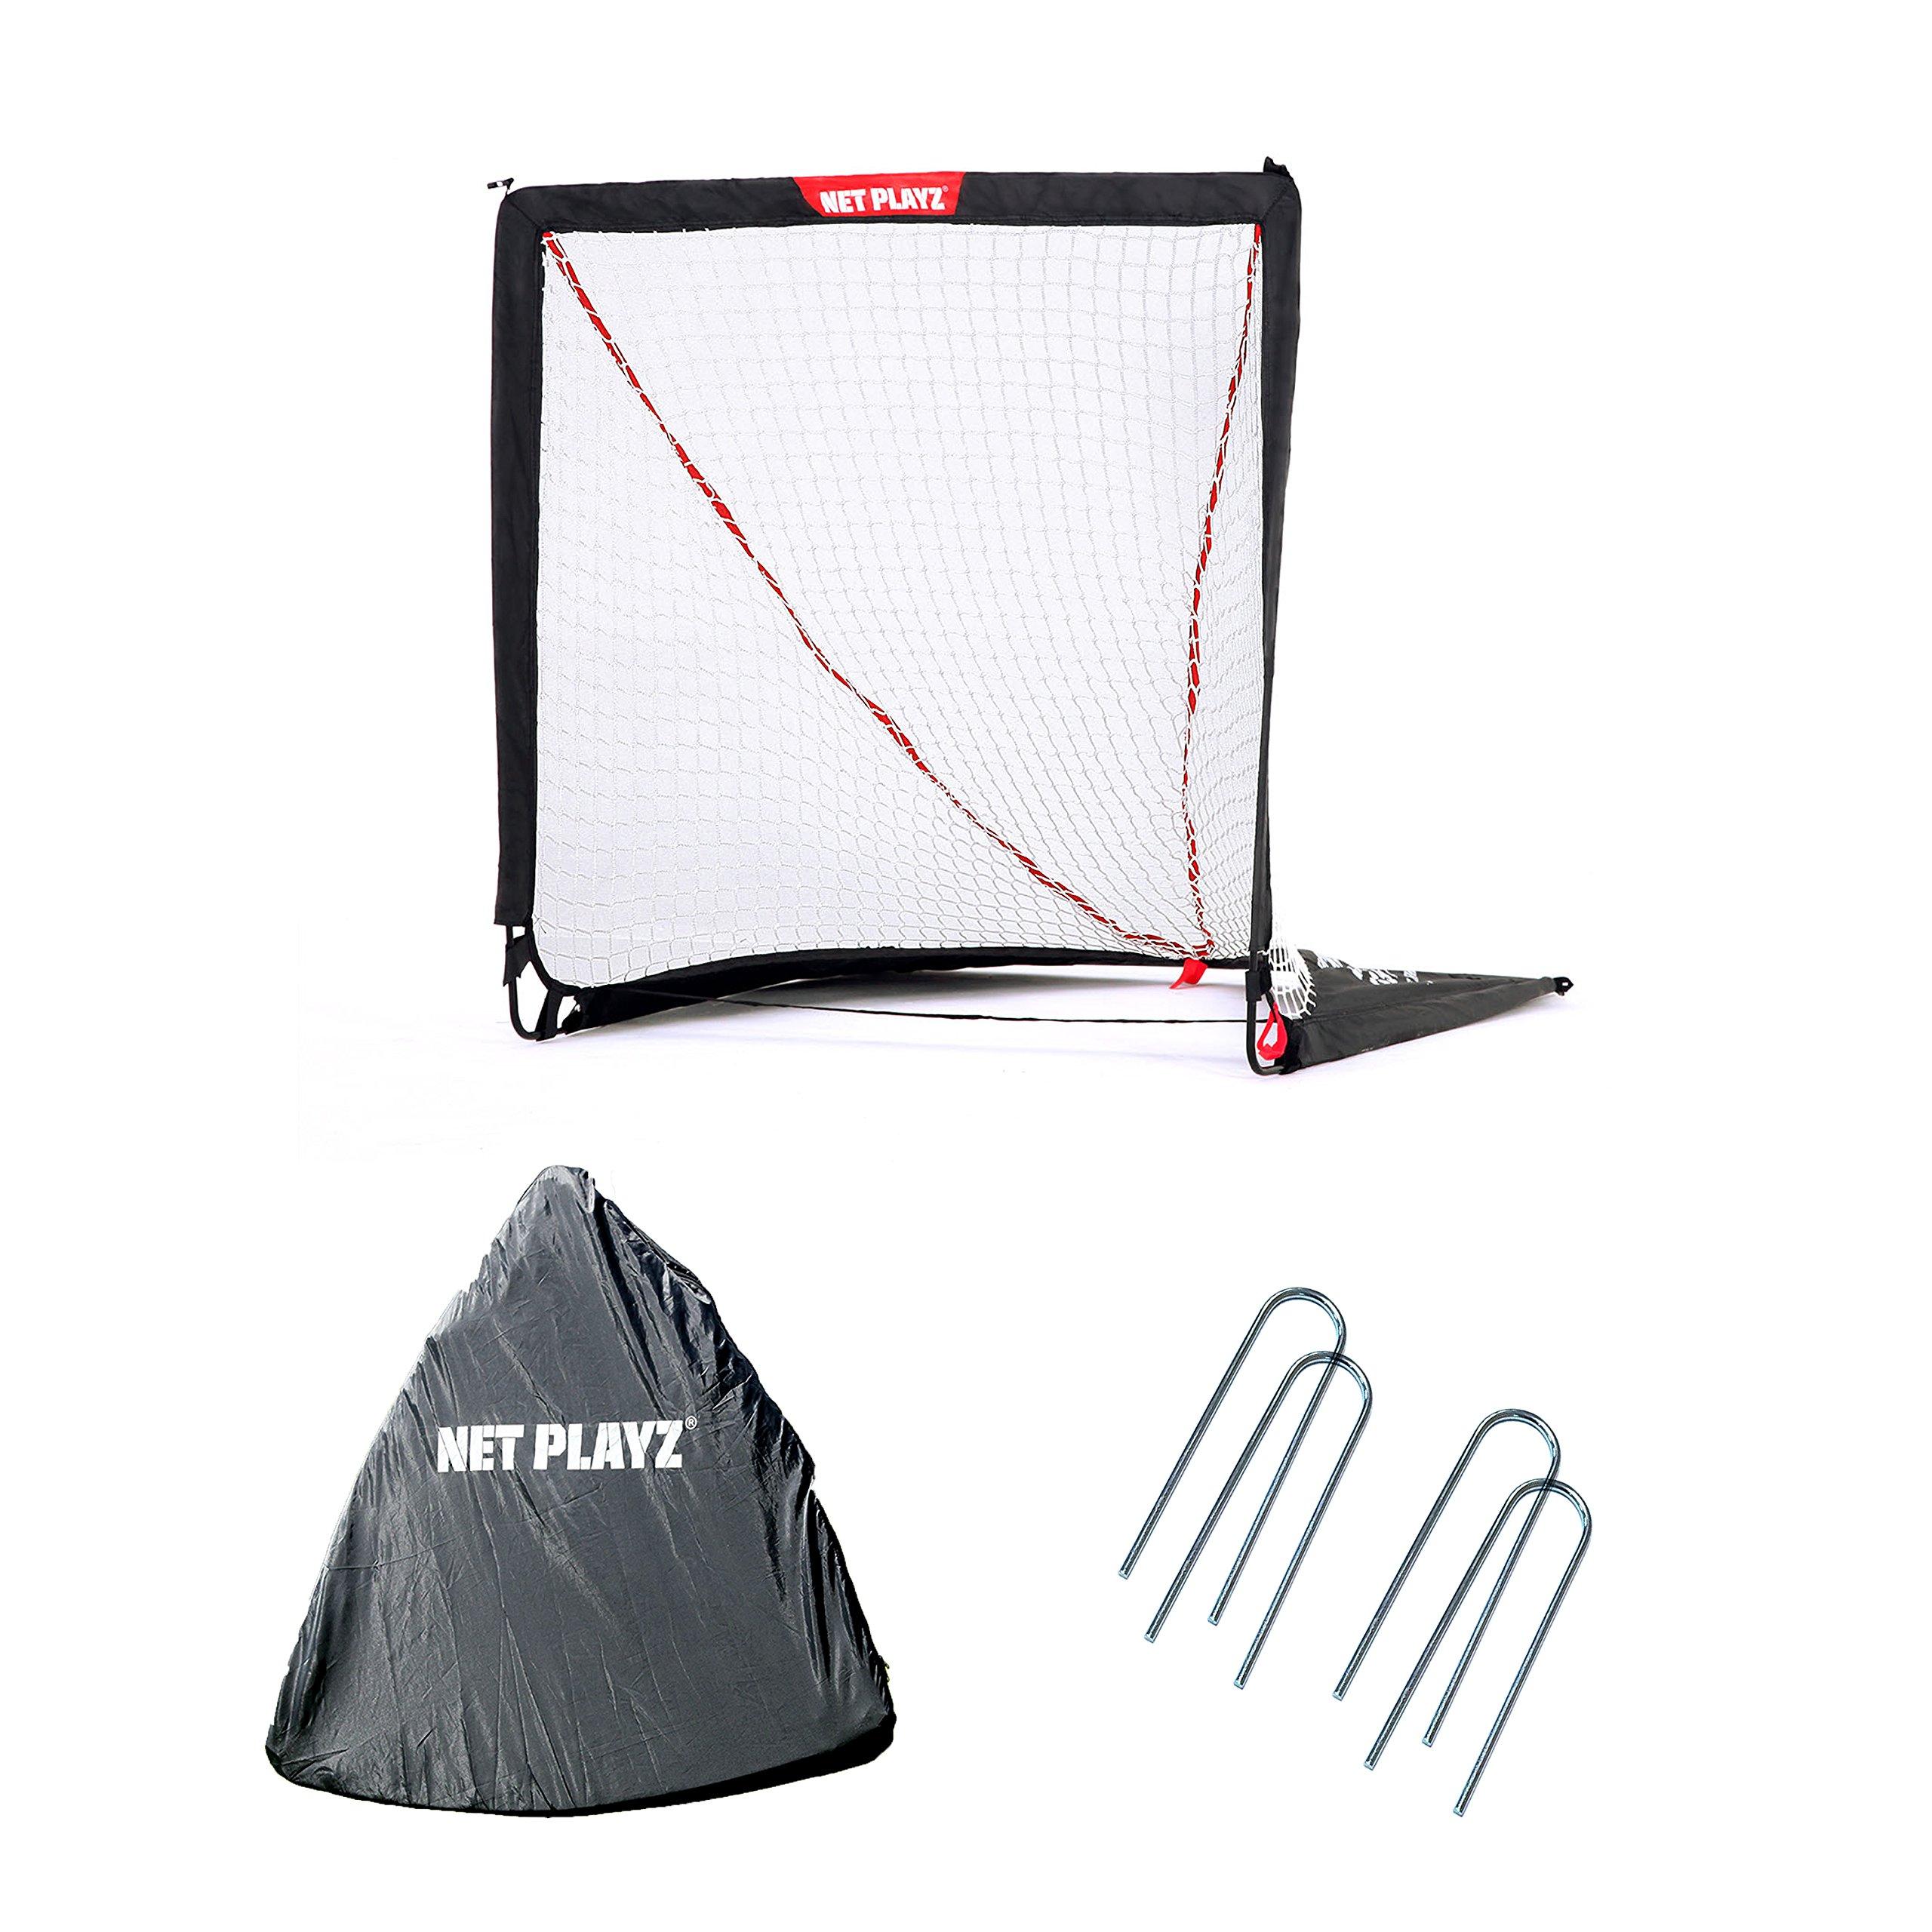 NET PLAYZ 4 x 4 x 4 Feet Lacrosse Goal Fast Install, Fiberglass Frme, Lightweight, Foldable, Portable, Carry bag Included by NET PLAYZ (Image #4)